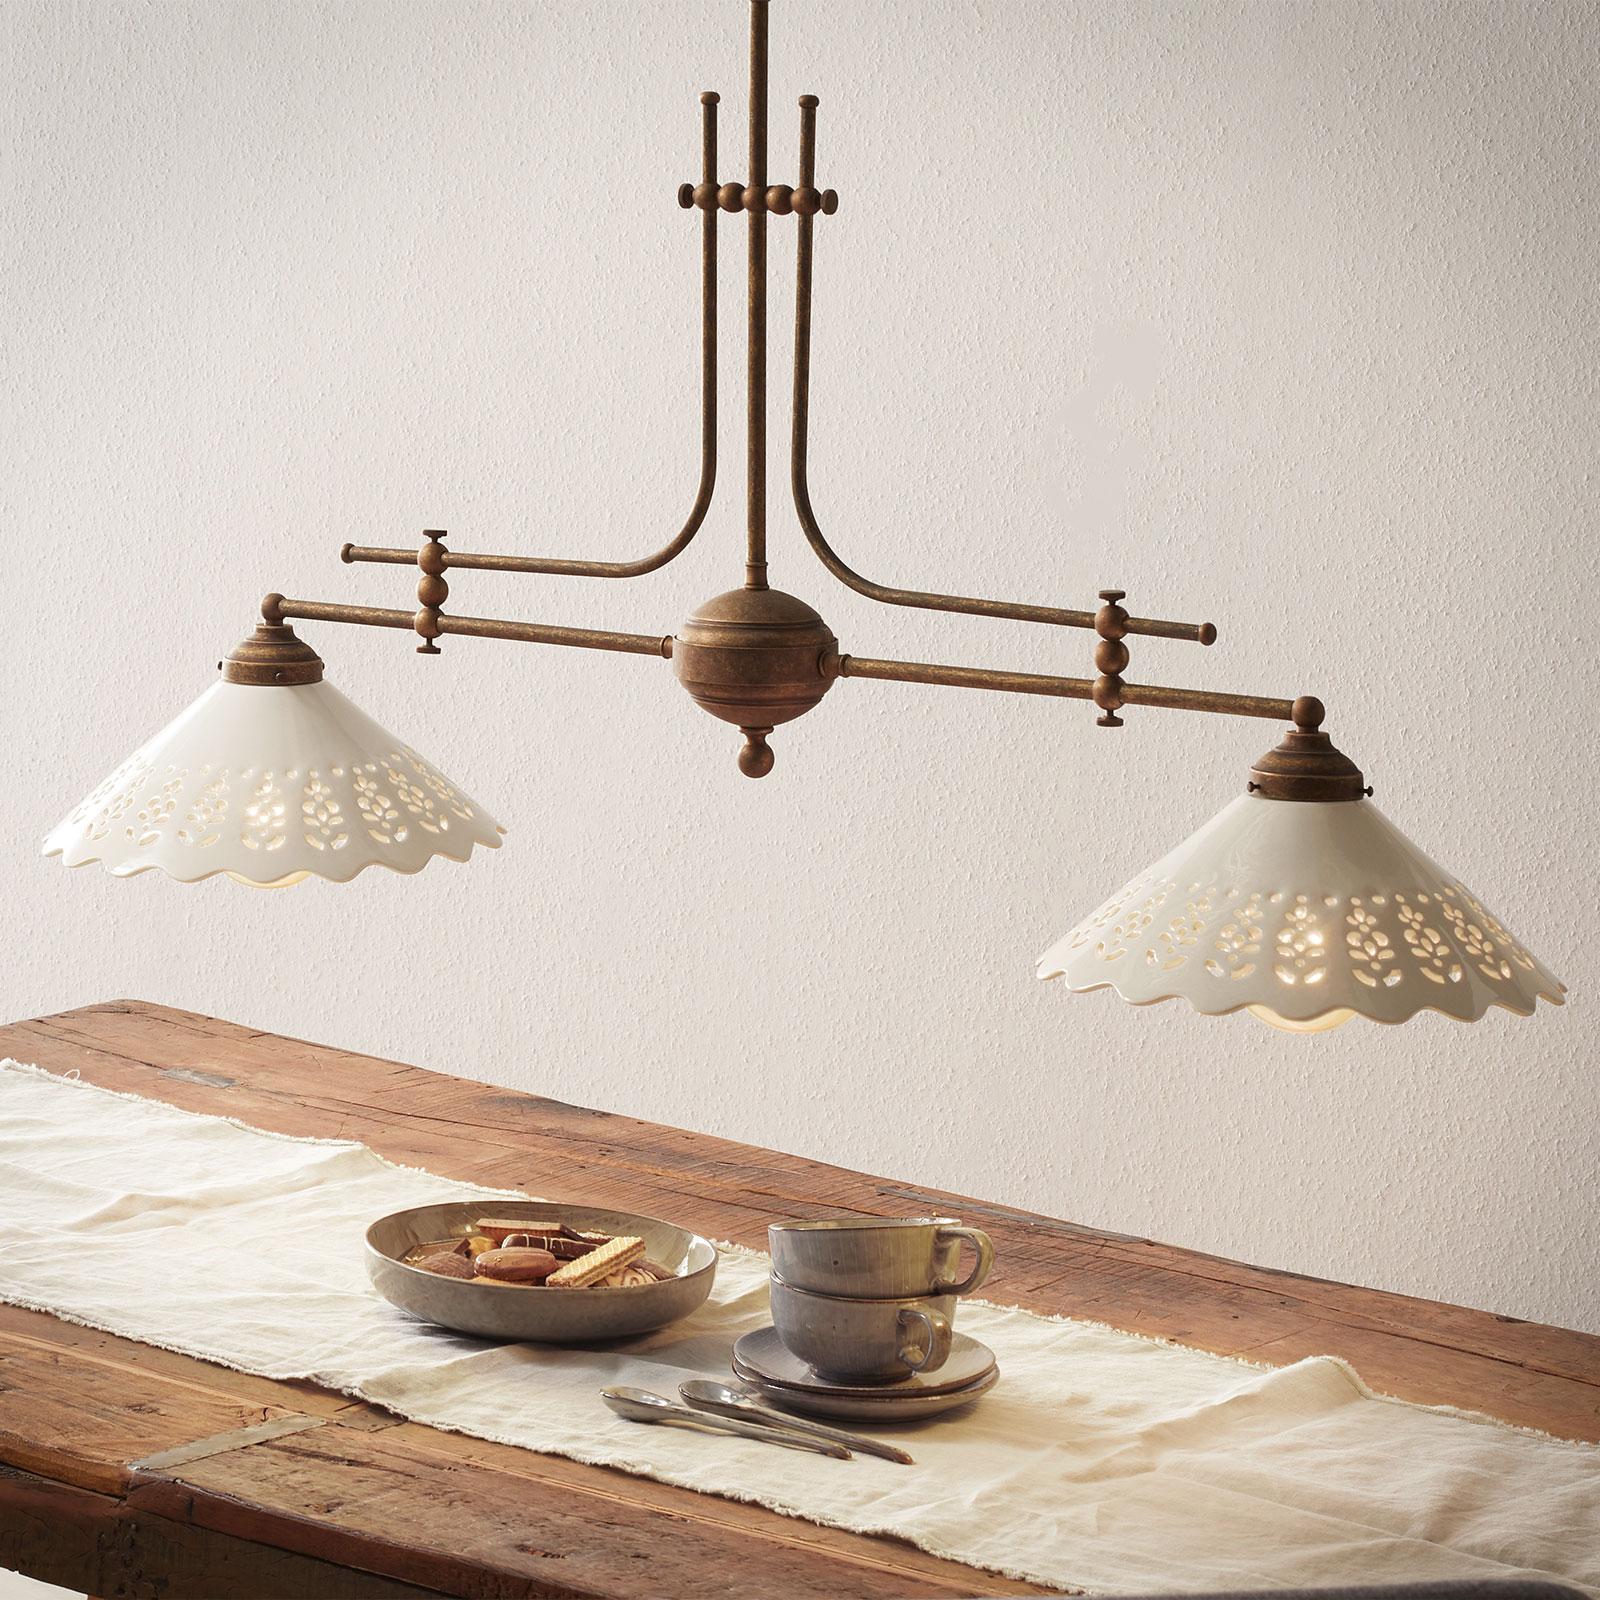 Lámpara colgante Pizzo con cadena, 2 luces